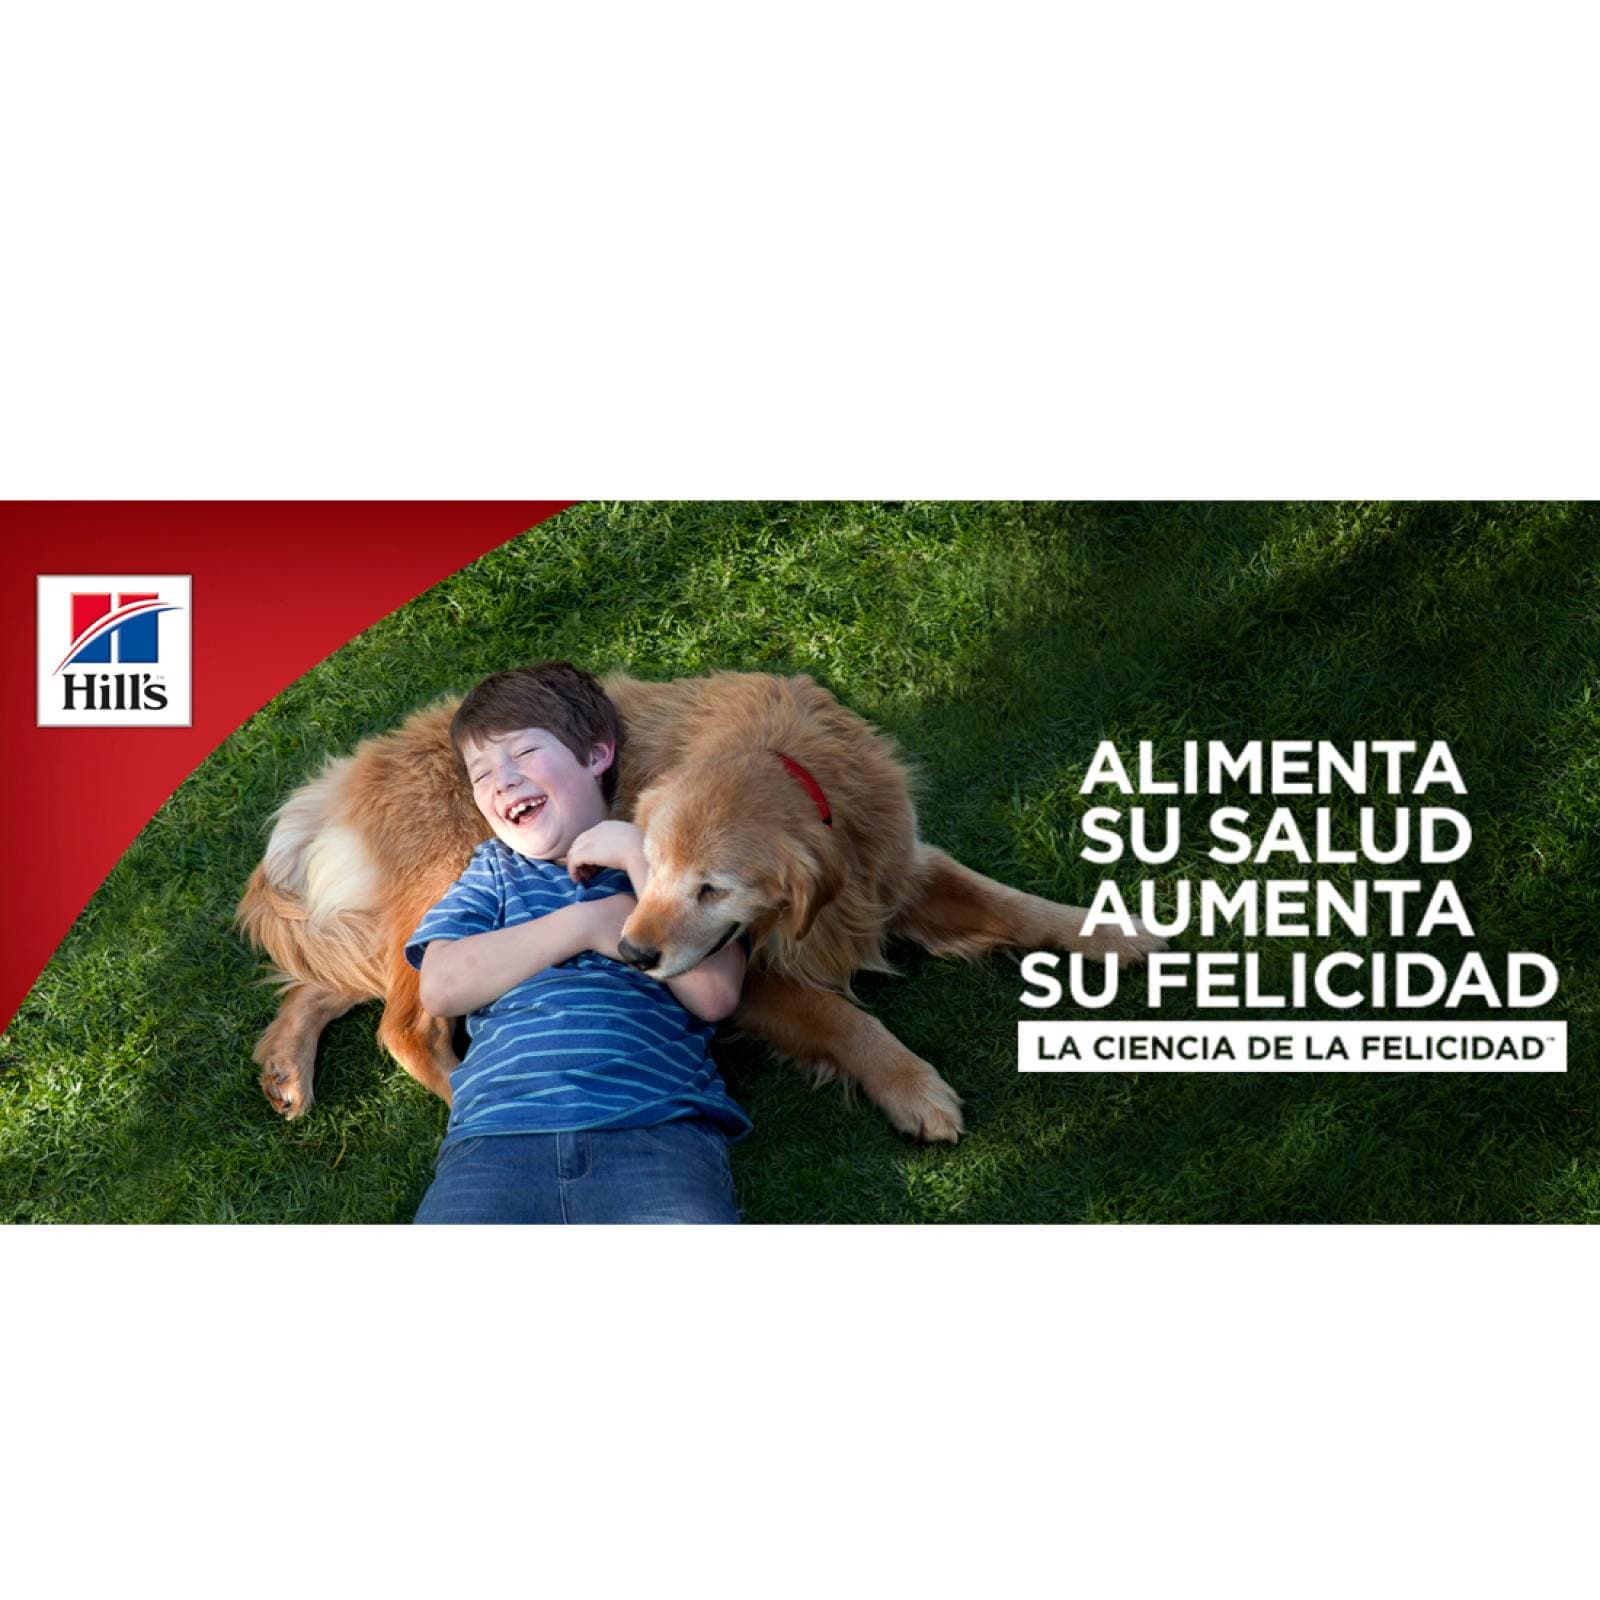 Alimento Perro Humeda Mascotas Artritis Pollo 368gr Hills